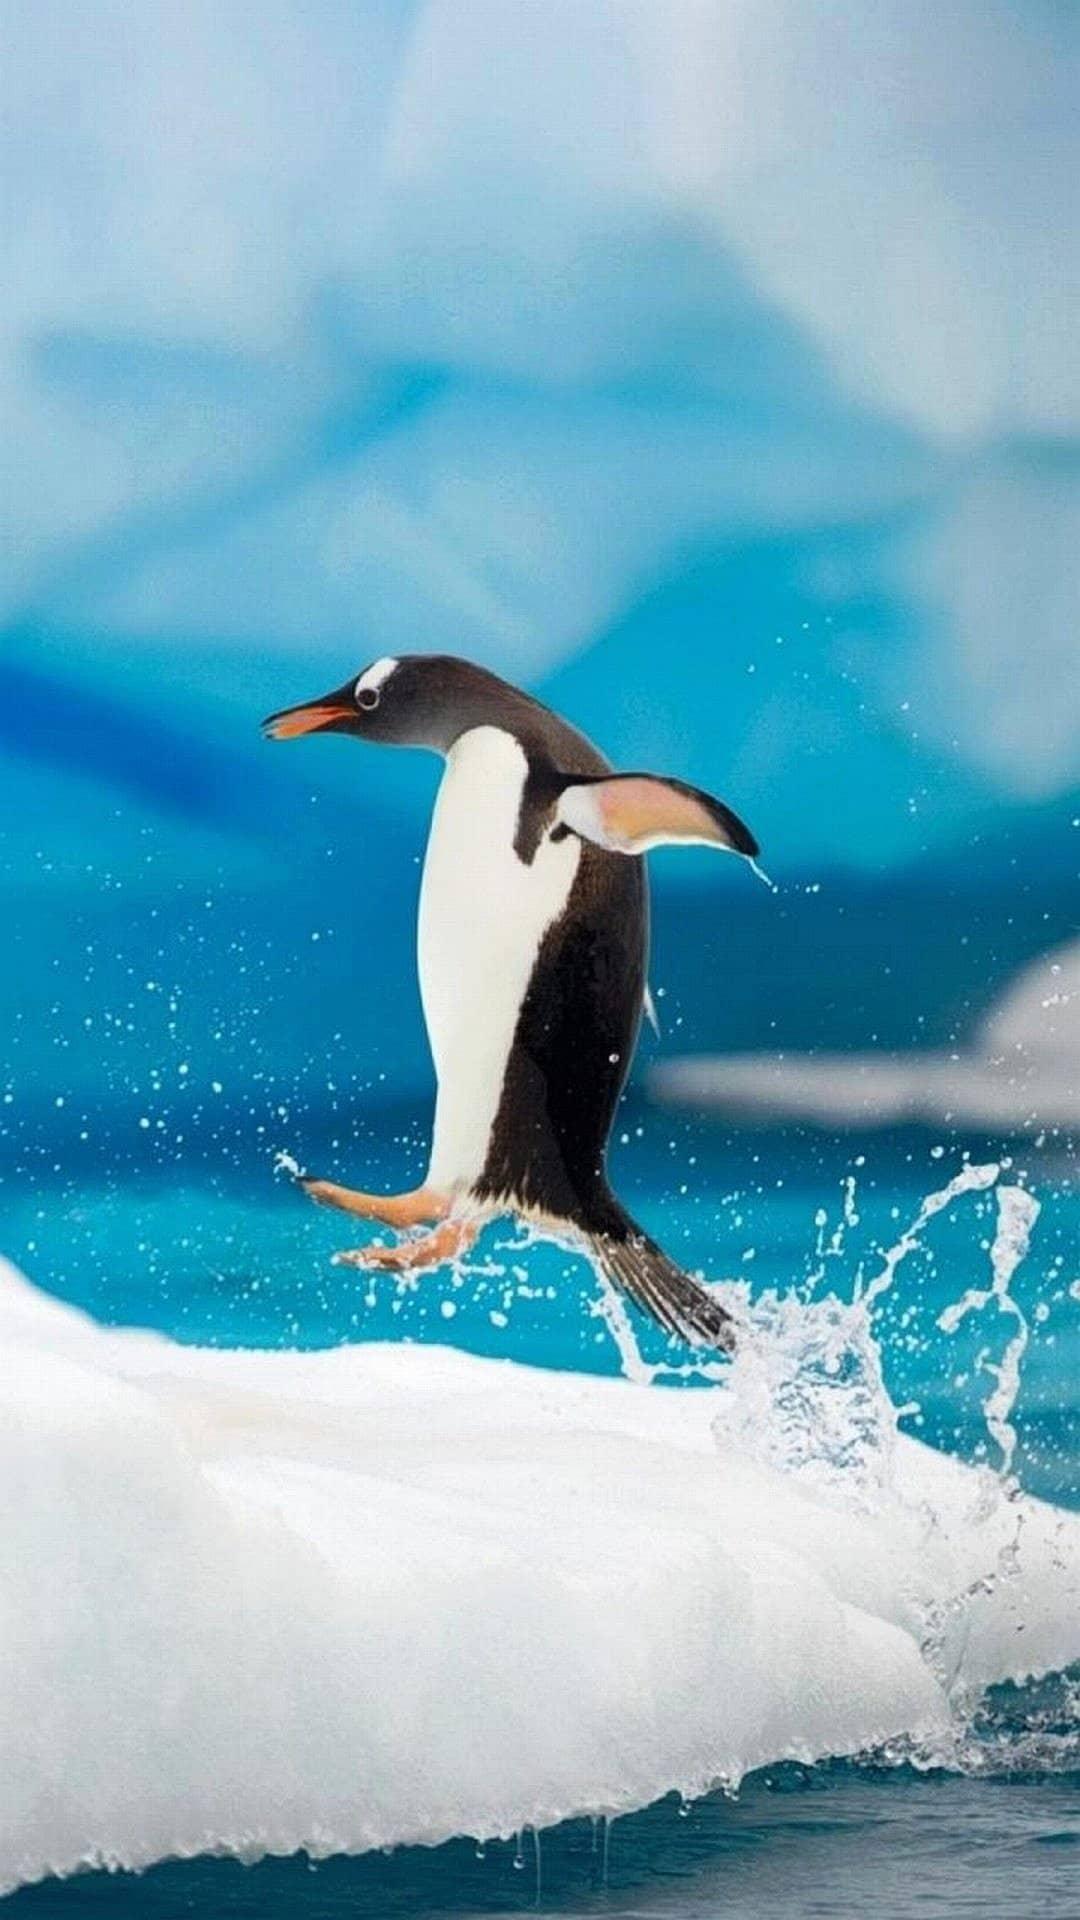 wallpaper-iphone-7-pinguin